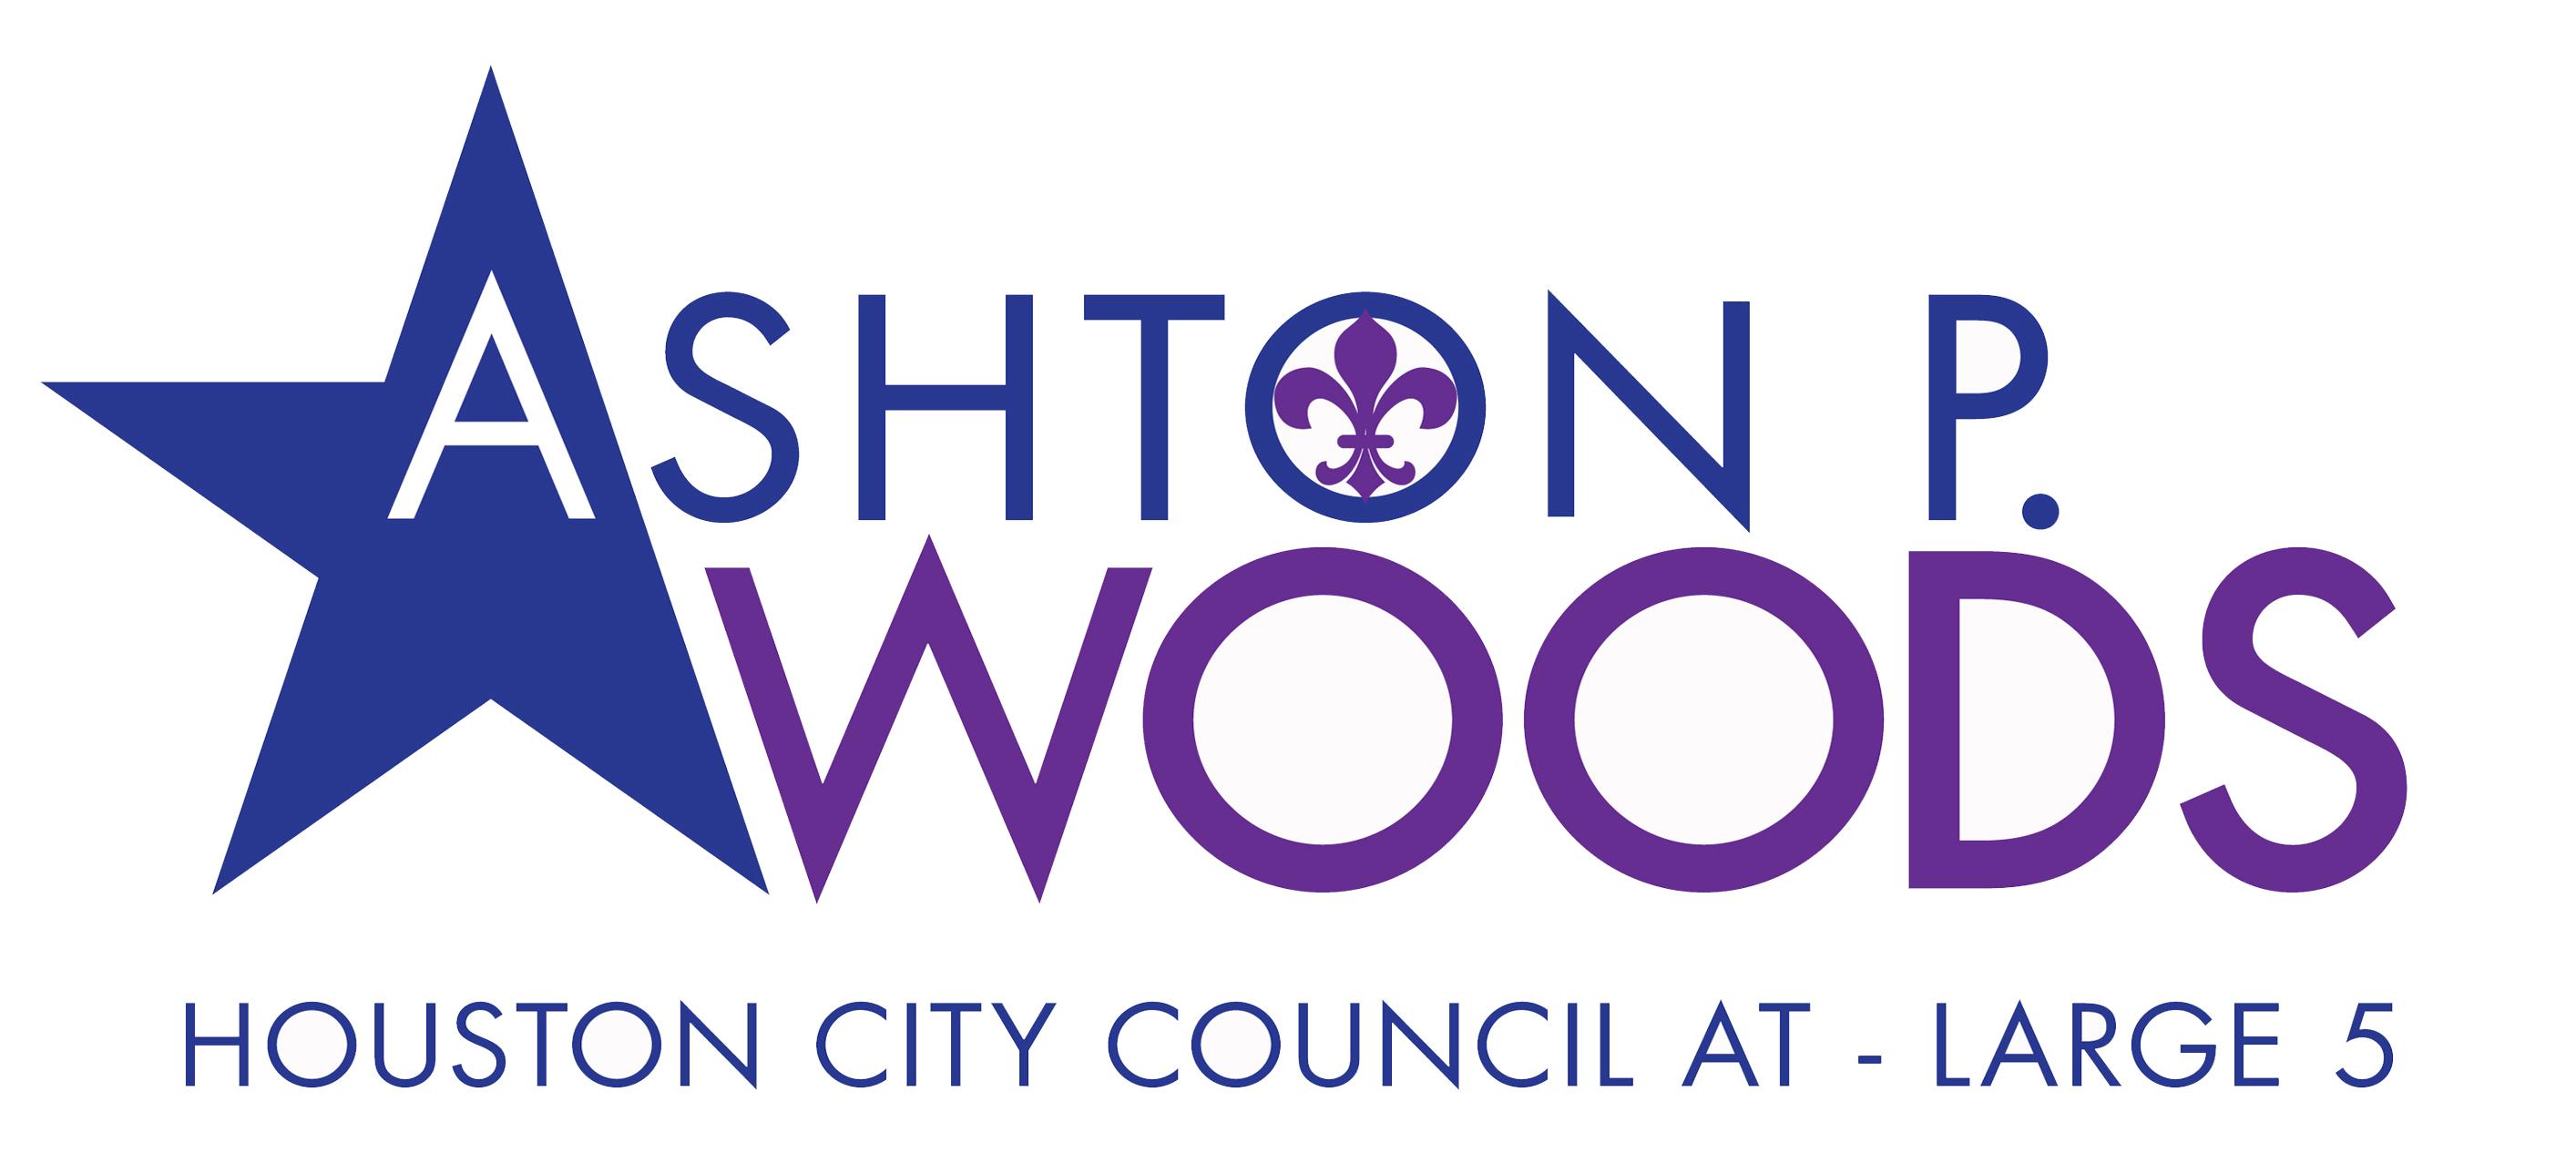 Ashton Woods